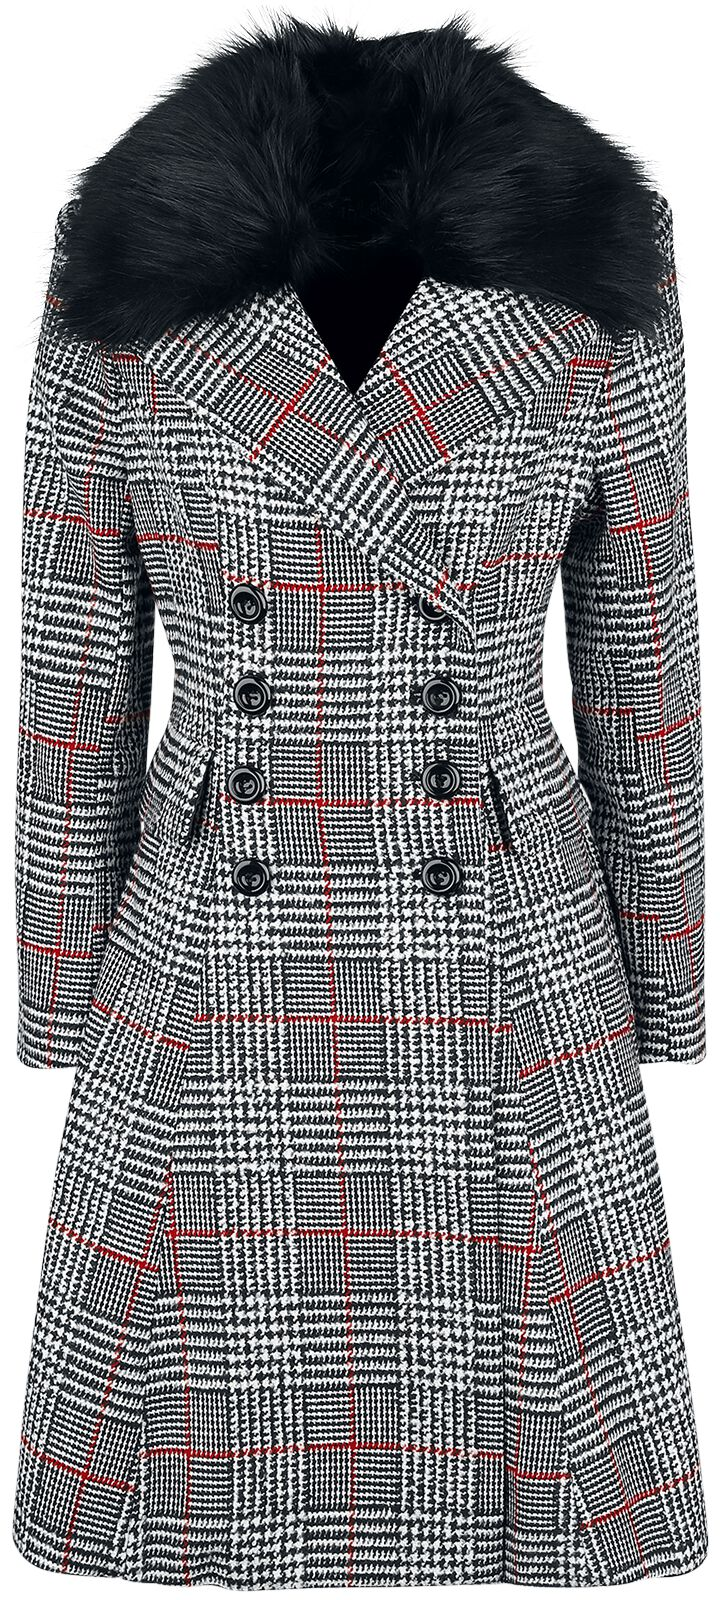 Jacken - Hell Bunny Pascale Coat Mantel schwarz weiß rot  - Onlineshop EMP